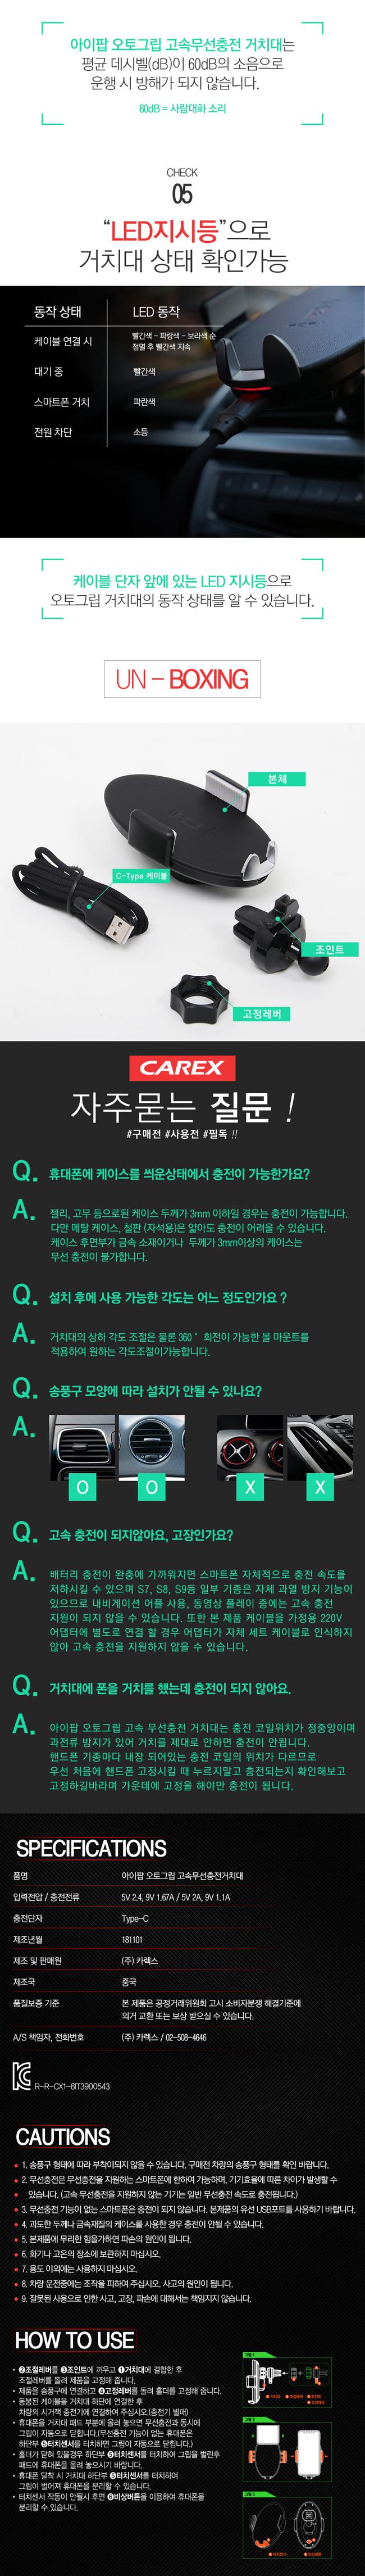 [CAREX] 카렉스 아이팝 송풍구용 스마트폰 오토그립 고속무선충전 거치대